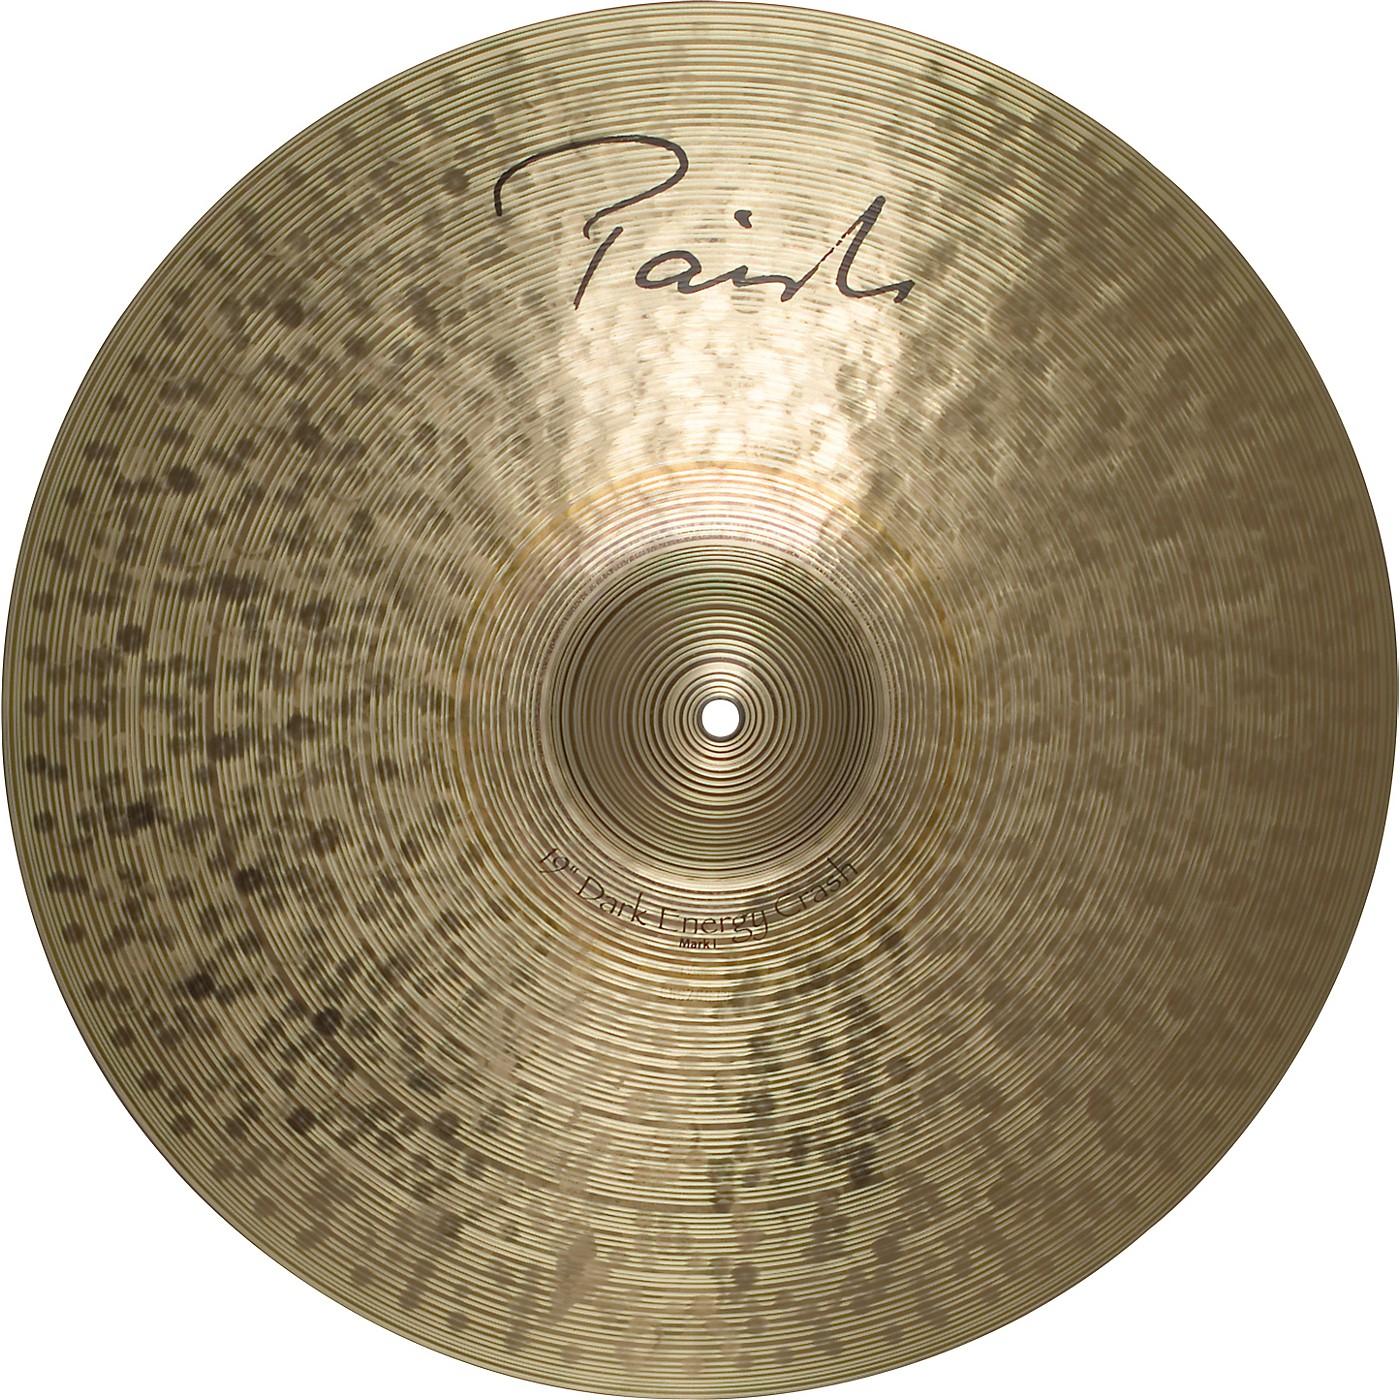 Paiste Signature Series Dark MKI Energy Crash Cymbal thumbnail